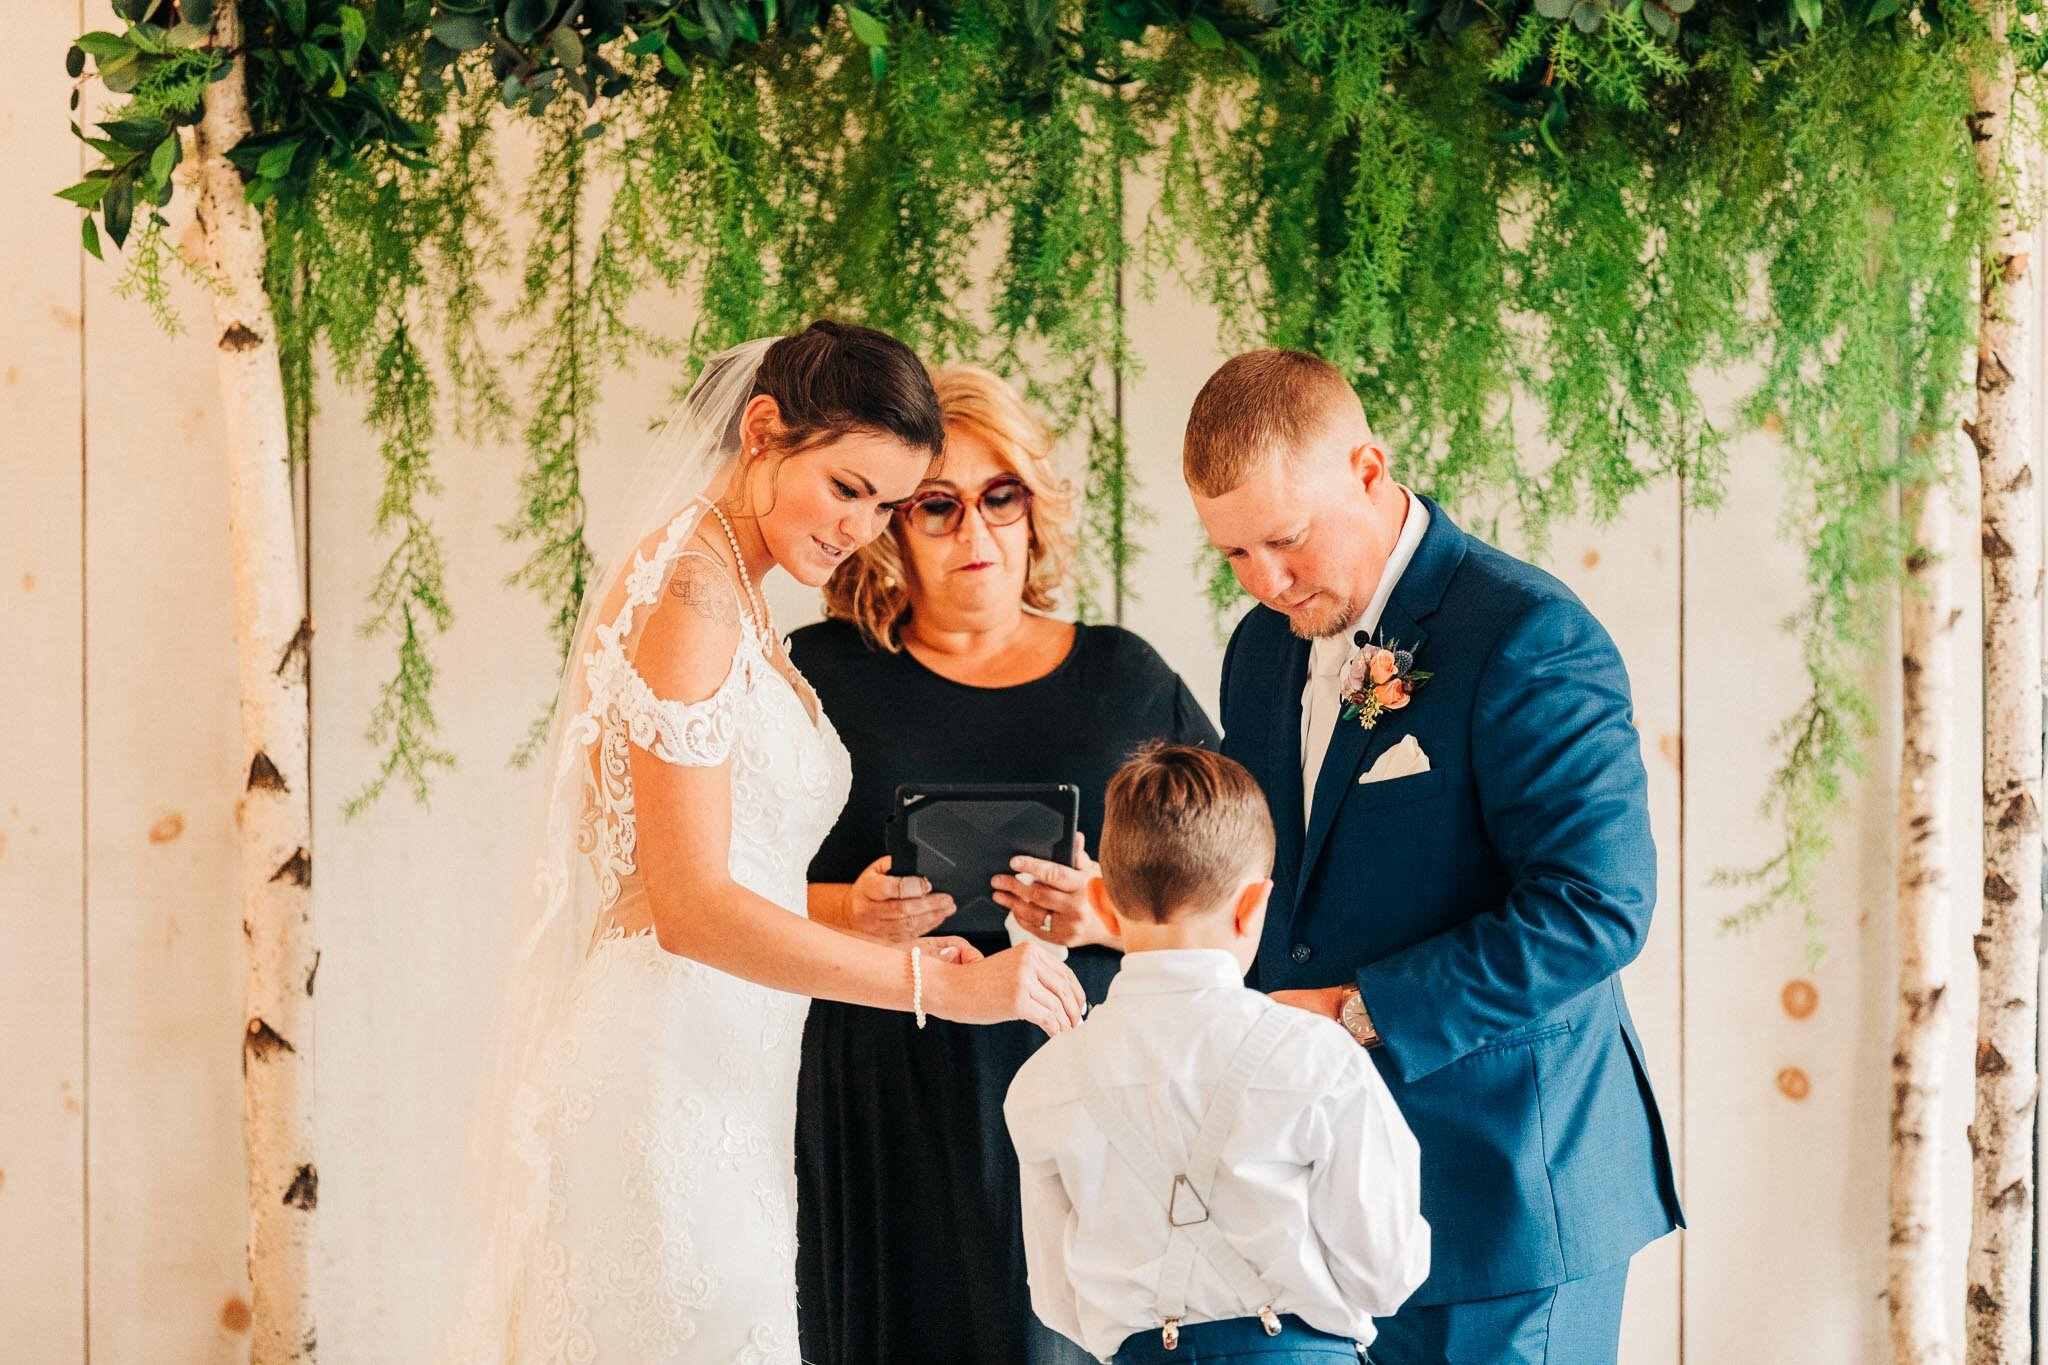 whitewoods-fall-wedding-2274.jpg